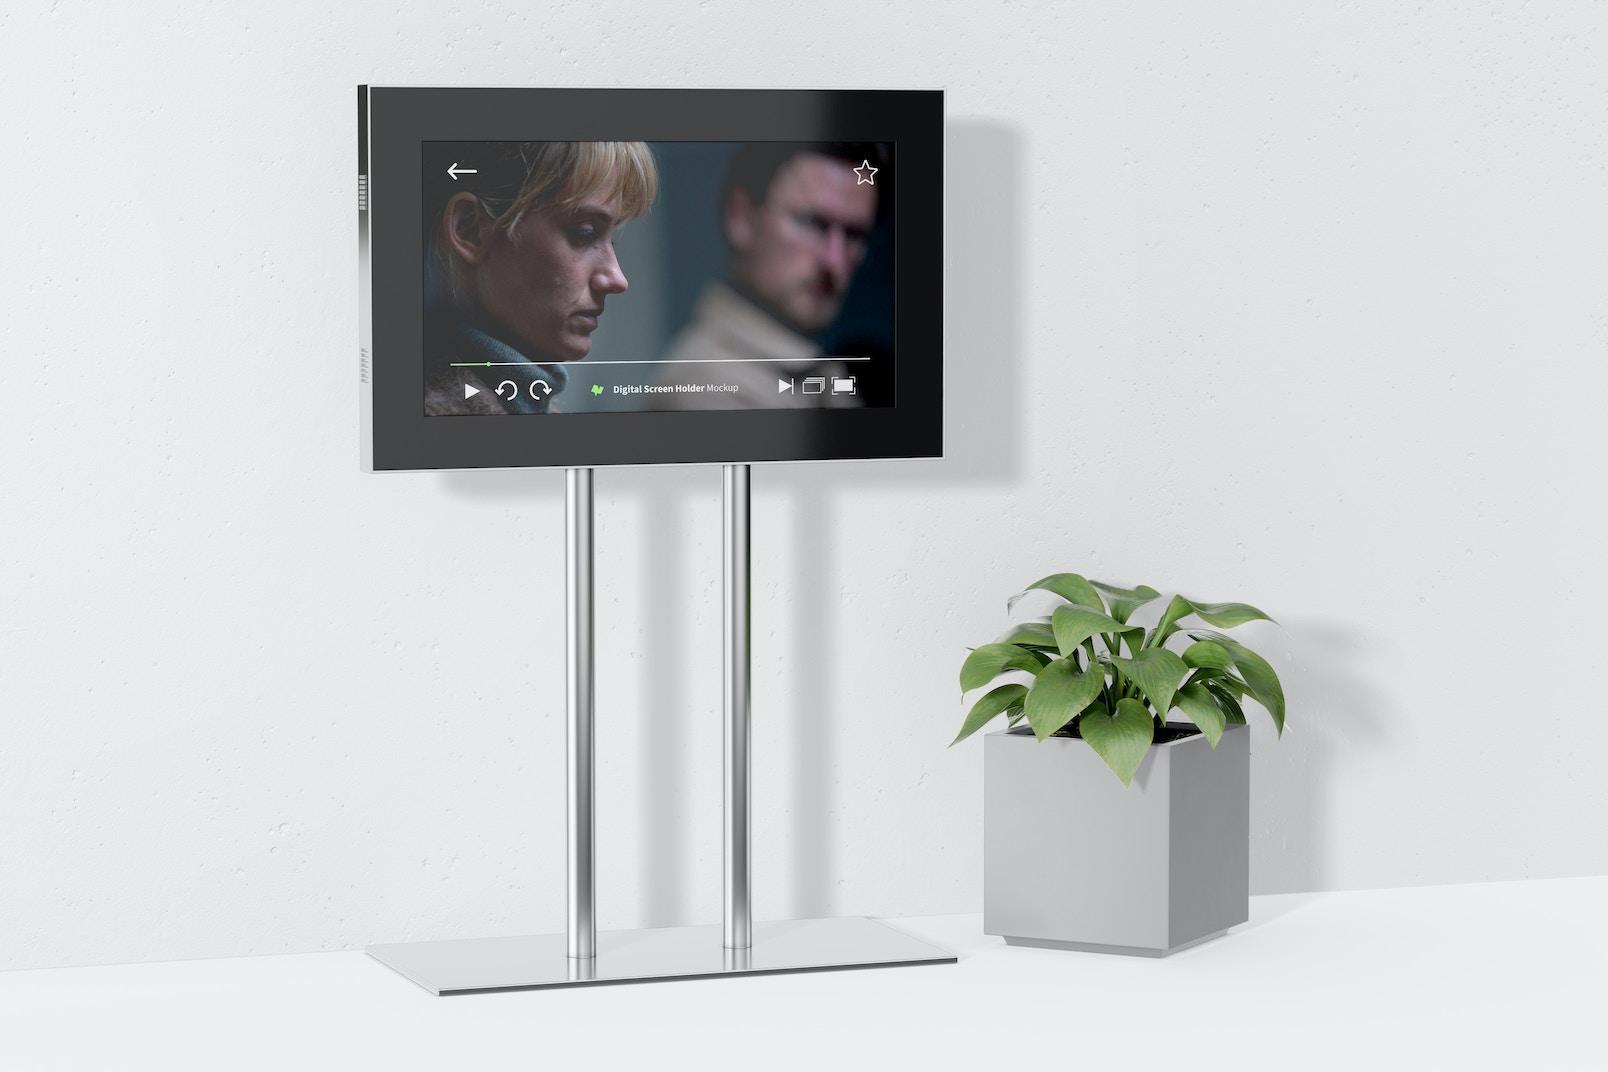 Digital Screen Holder with Pot Mockup